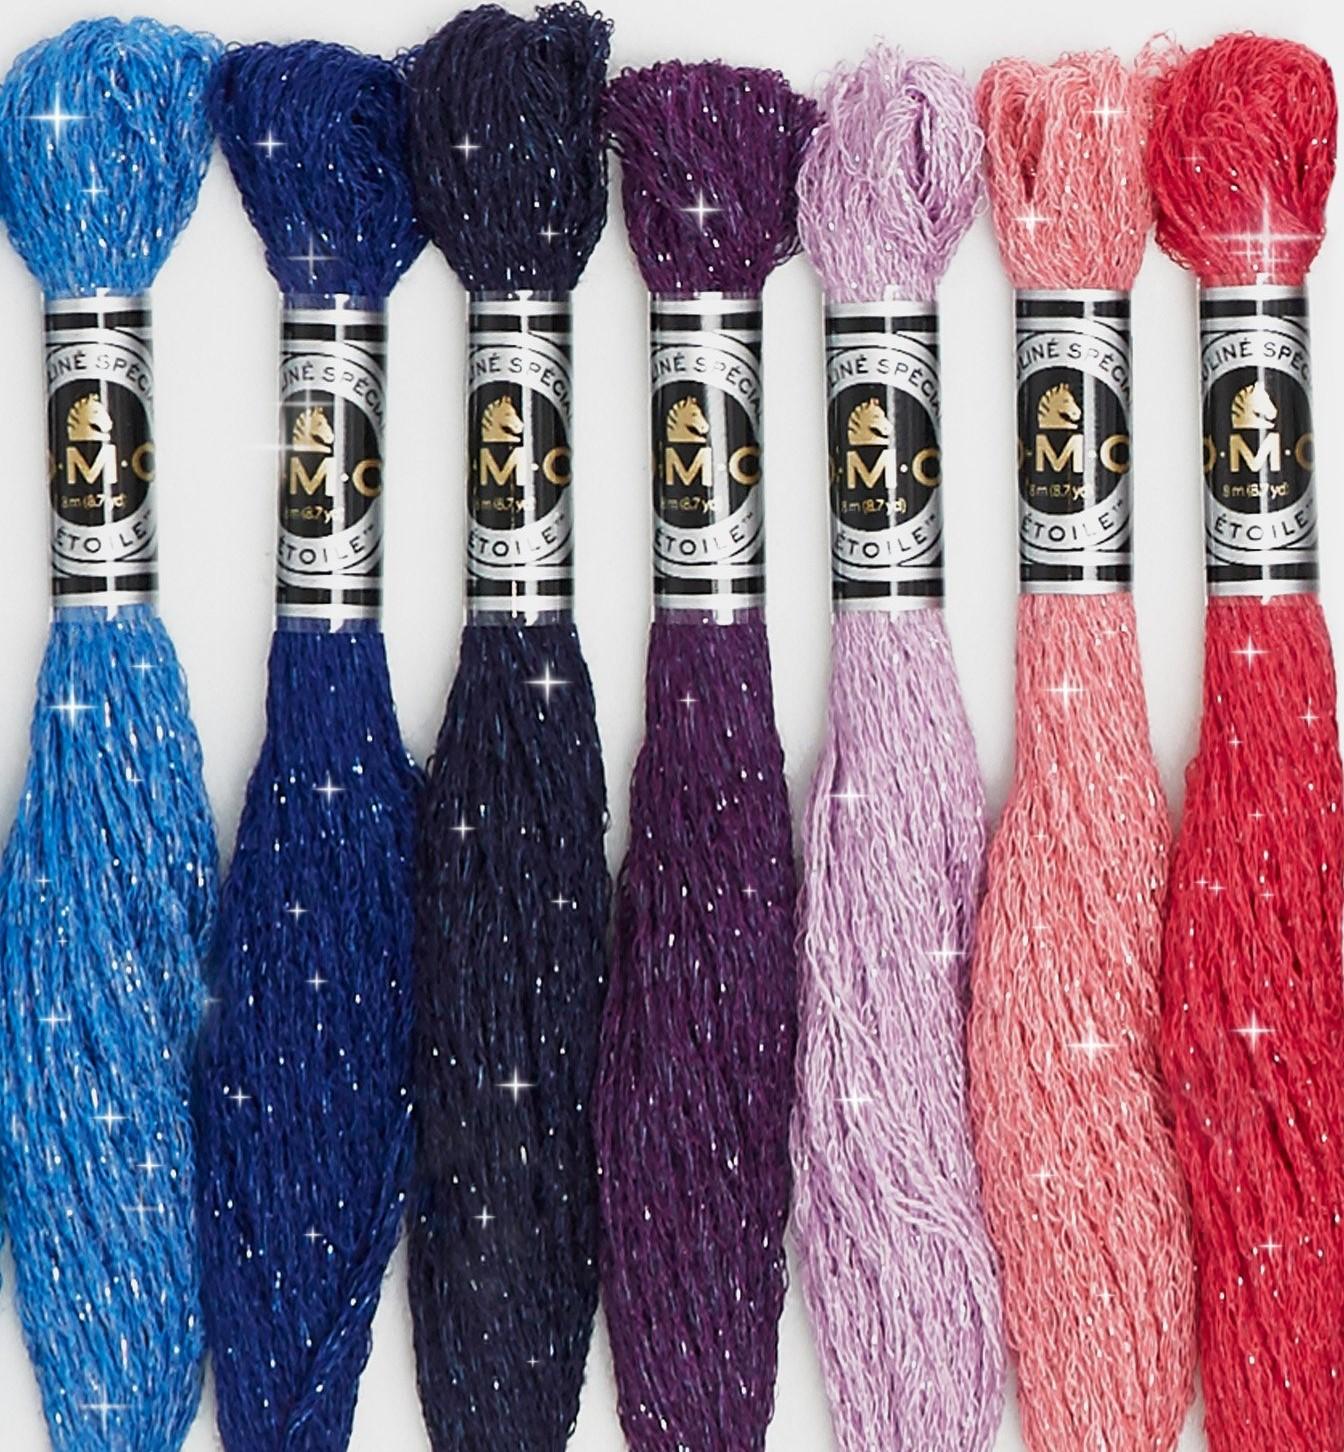 DMC Mouline Etoile Threads Art617